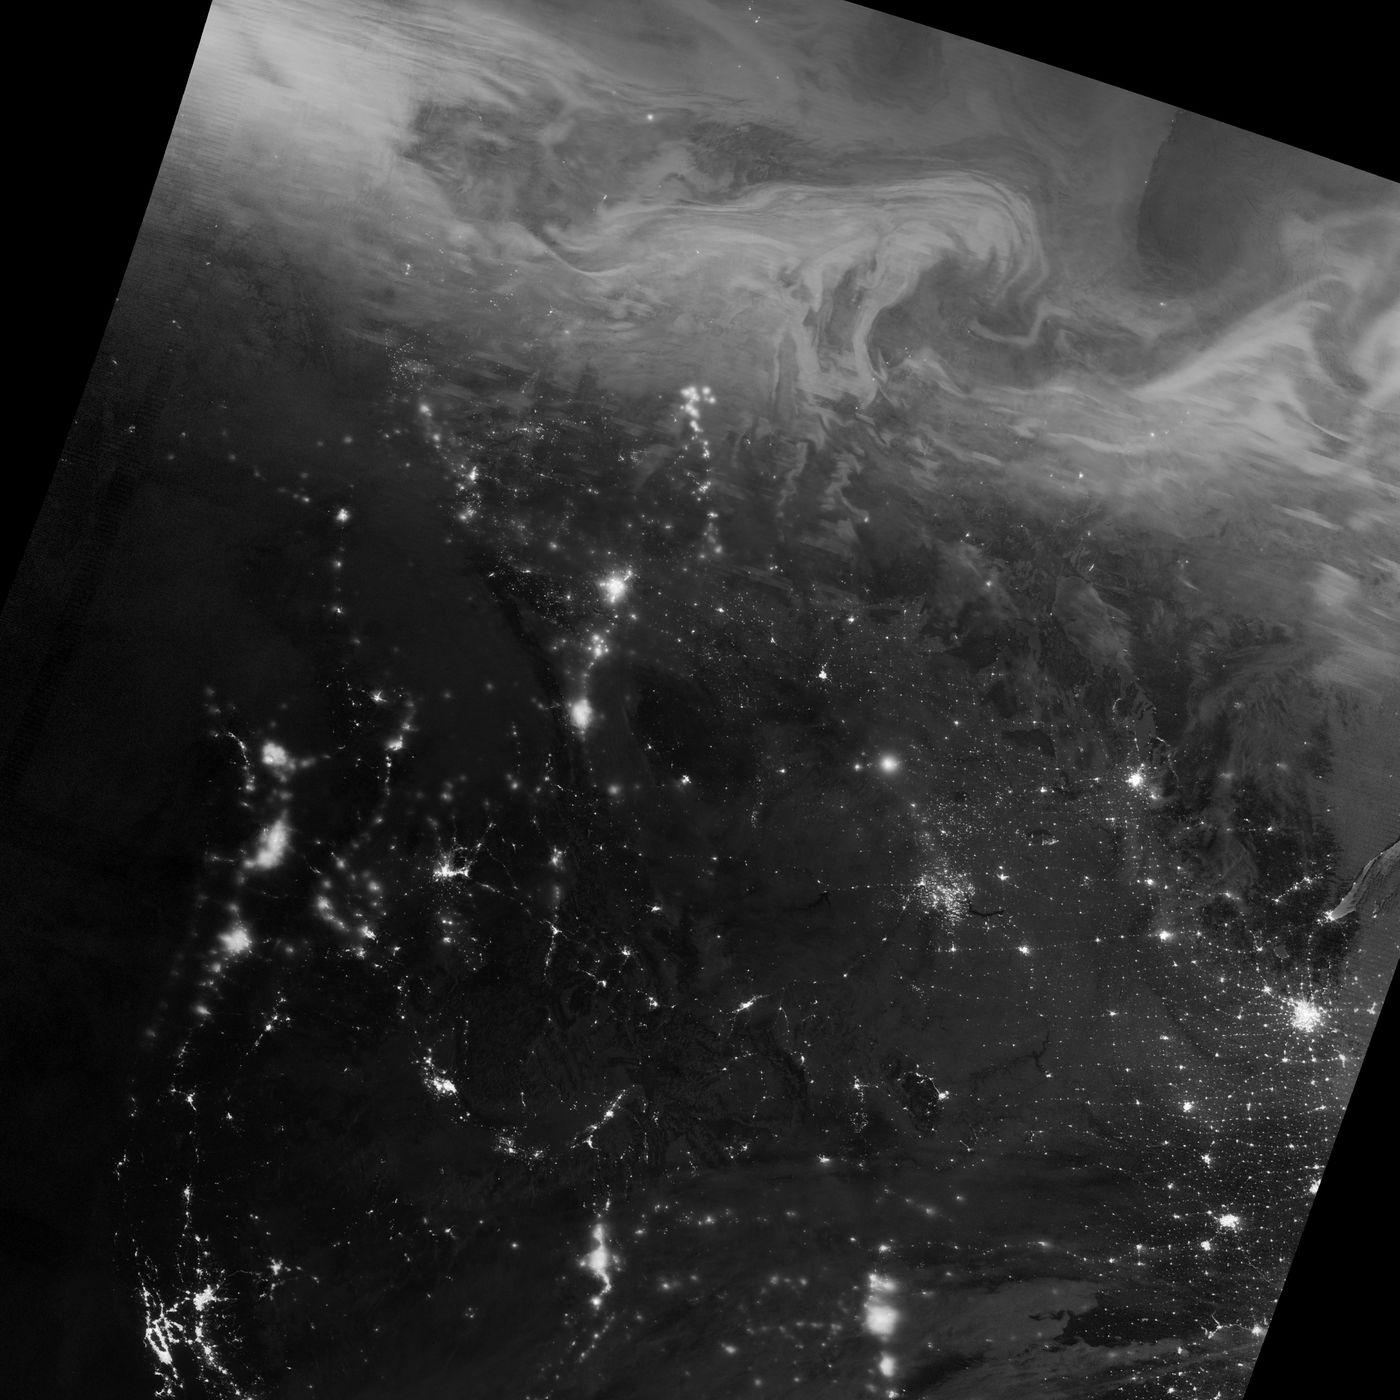 Northern Lights' Festive Show Captured in Stunning NASA Image